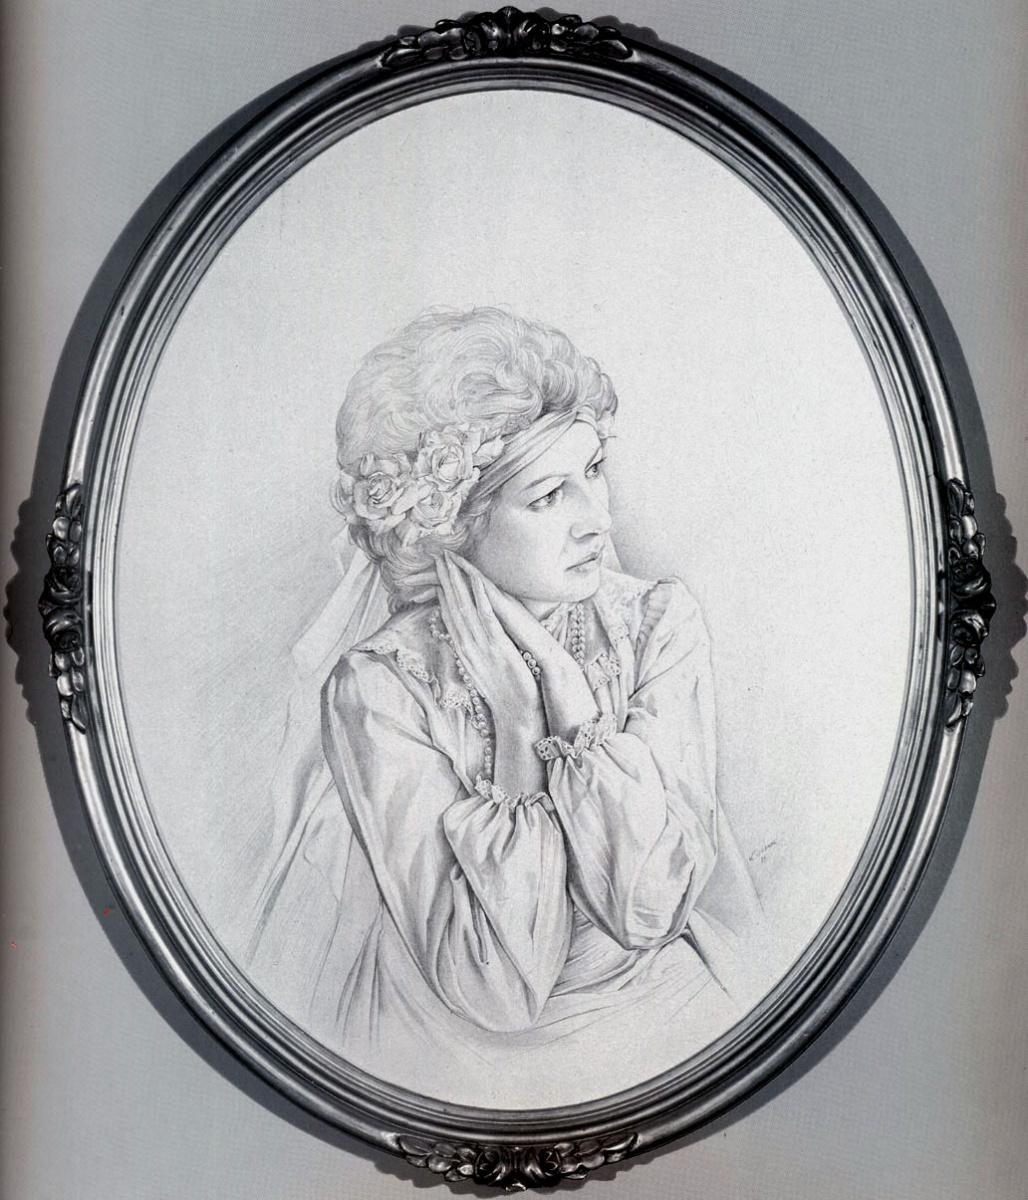 Voitek Siudmak. Portrait